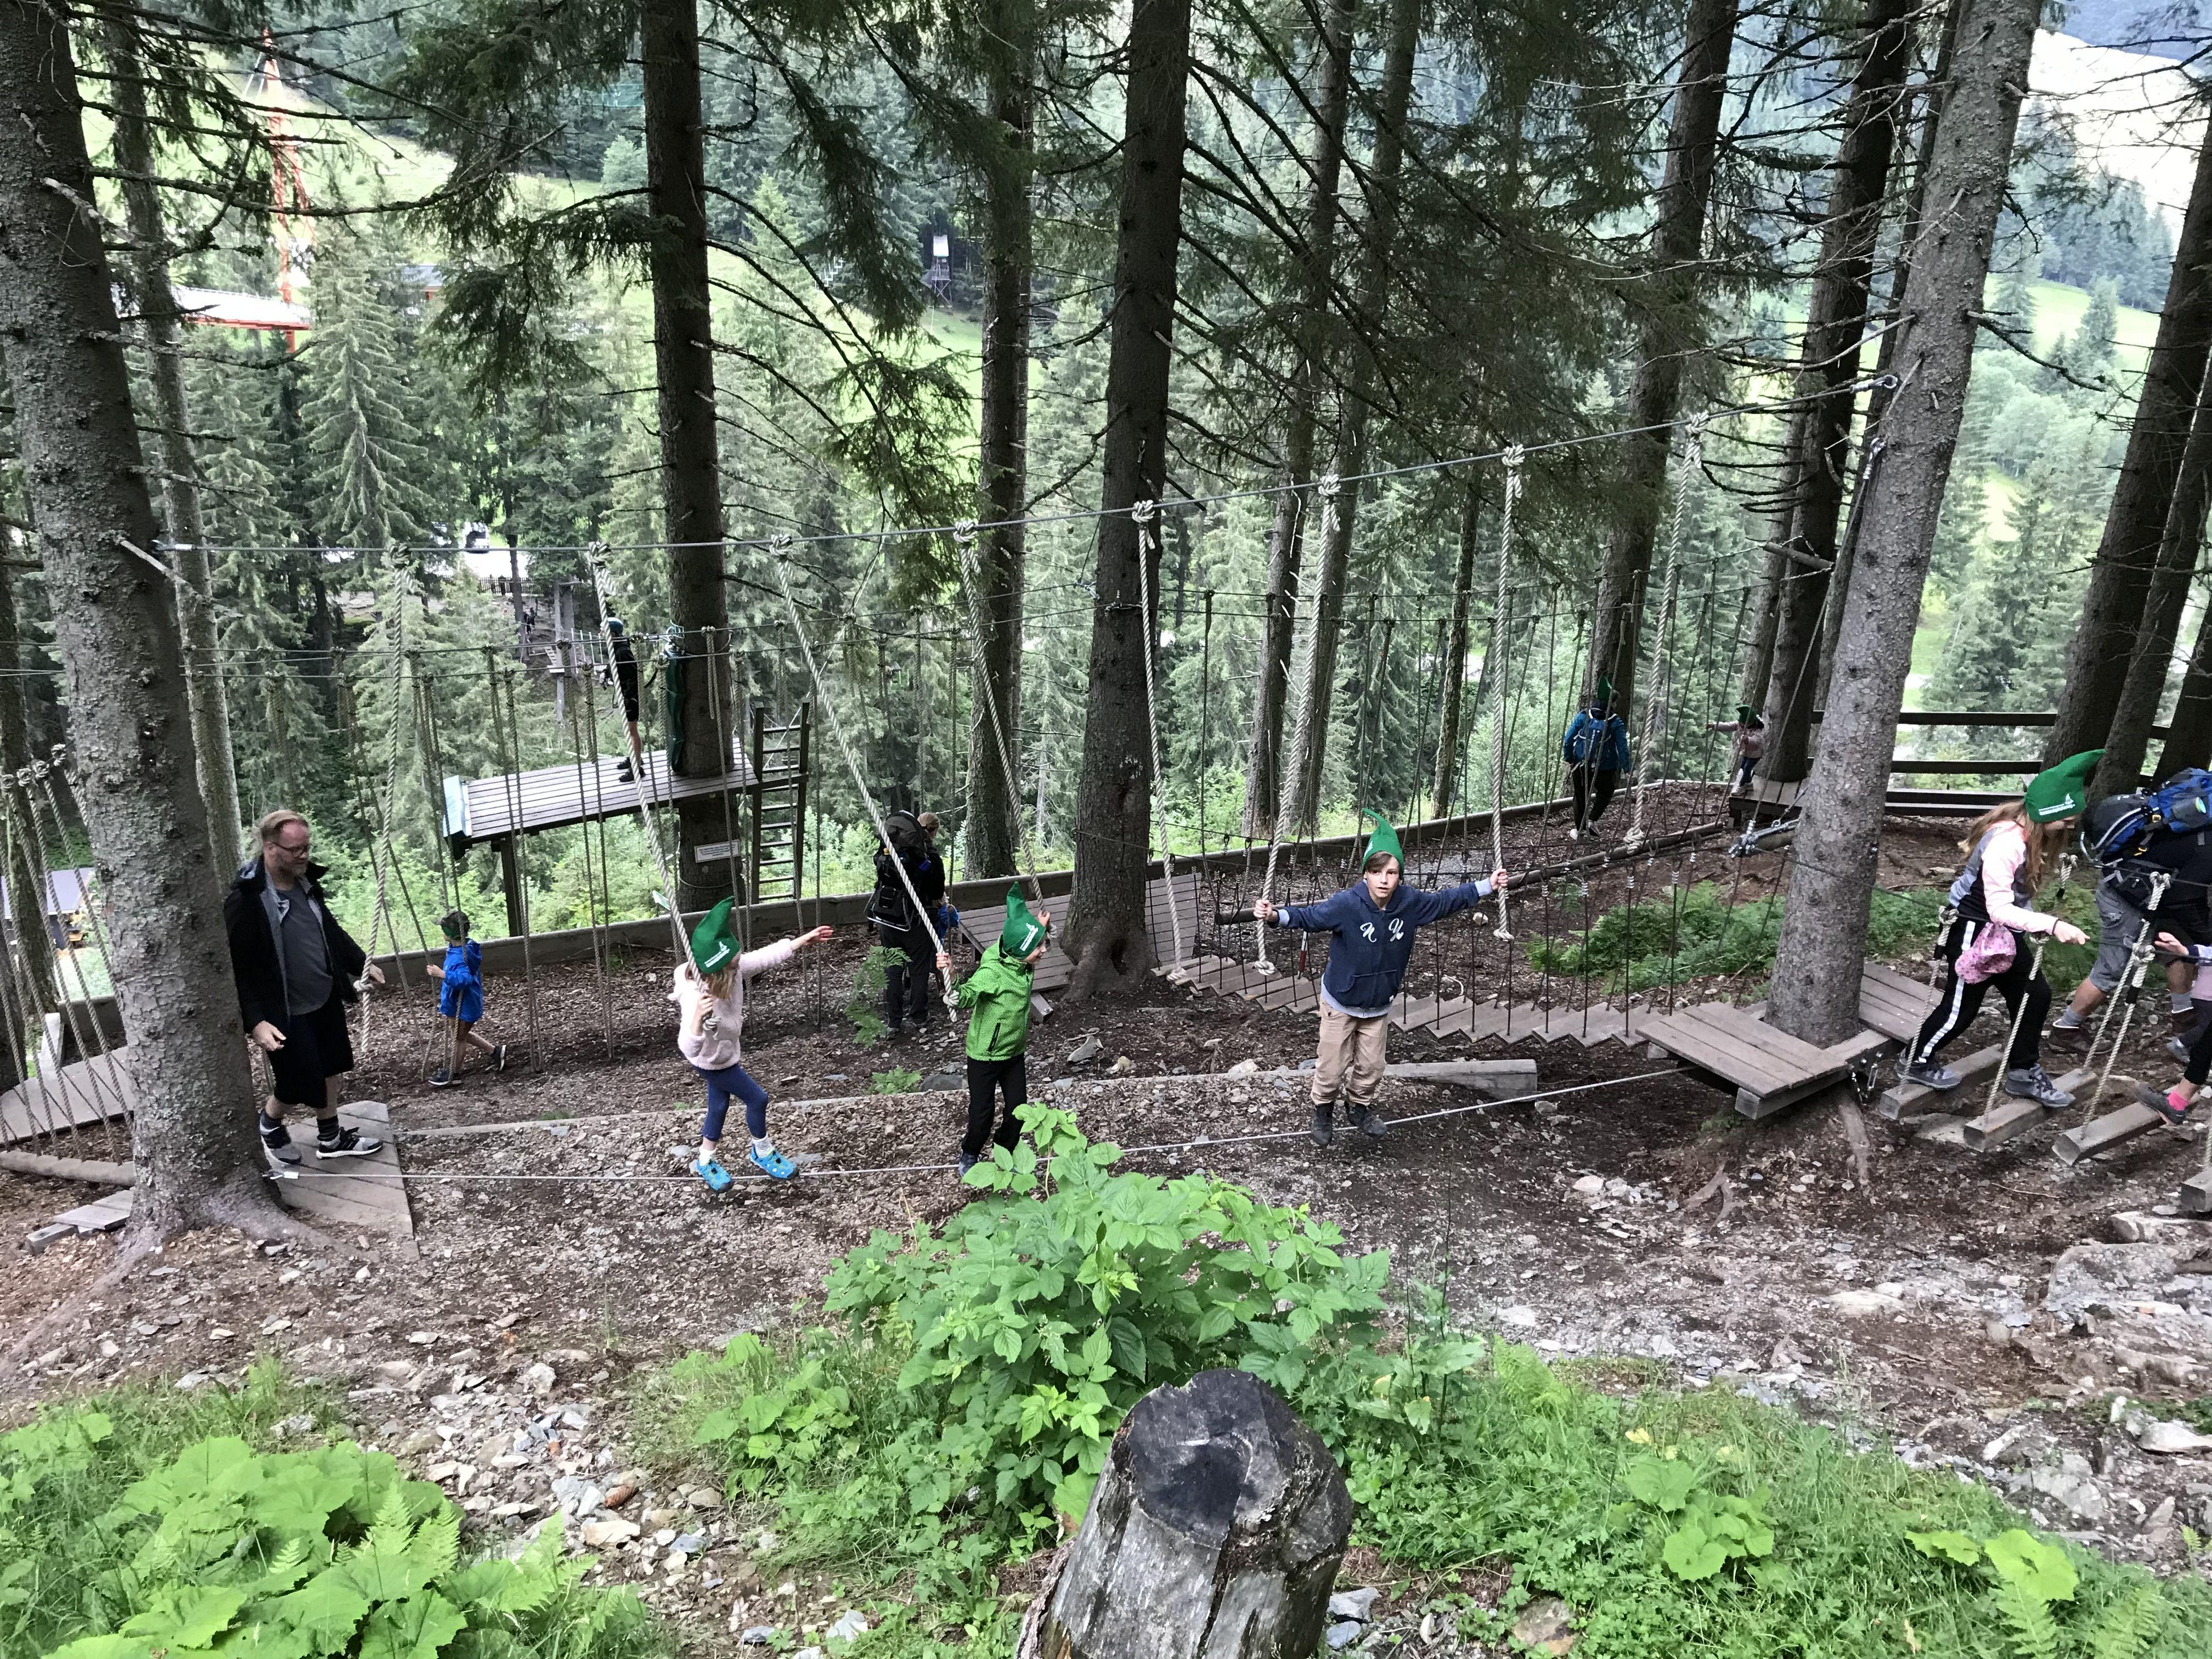 Stezka v korunách stromů v Lengau